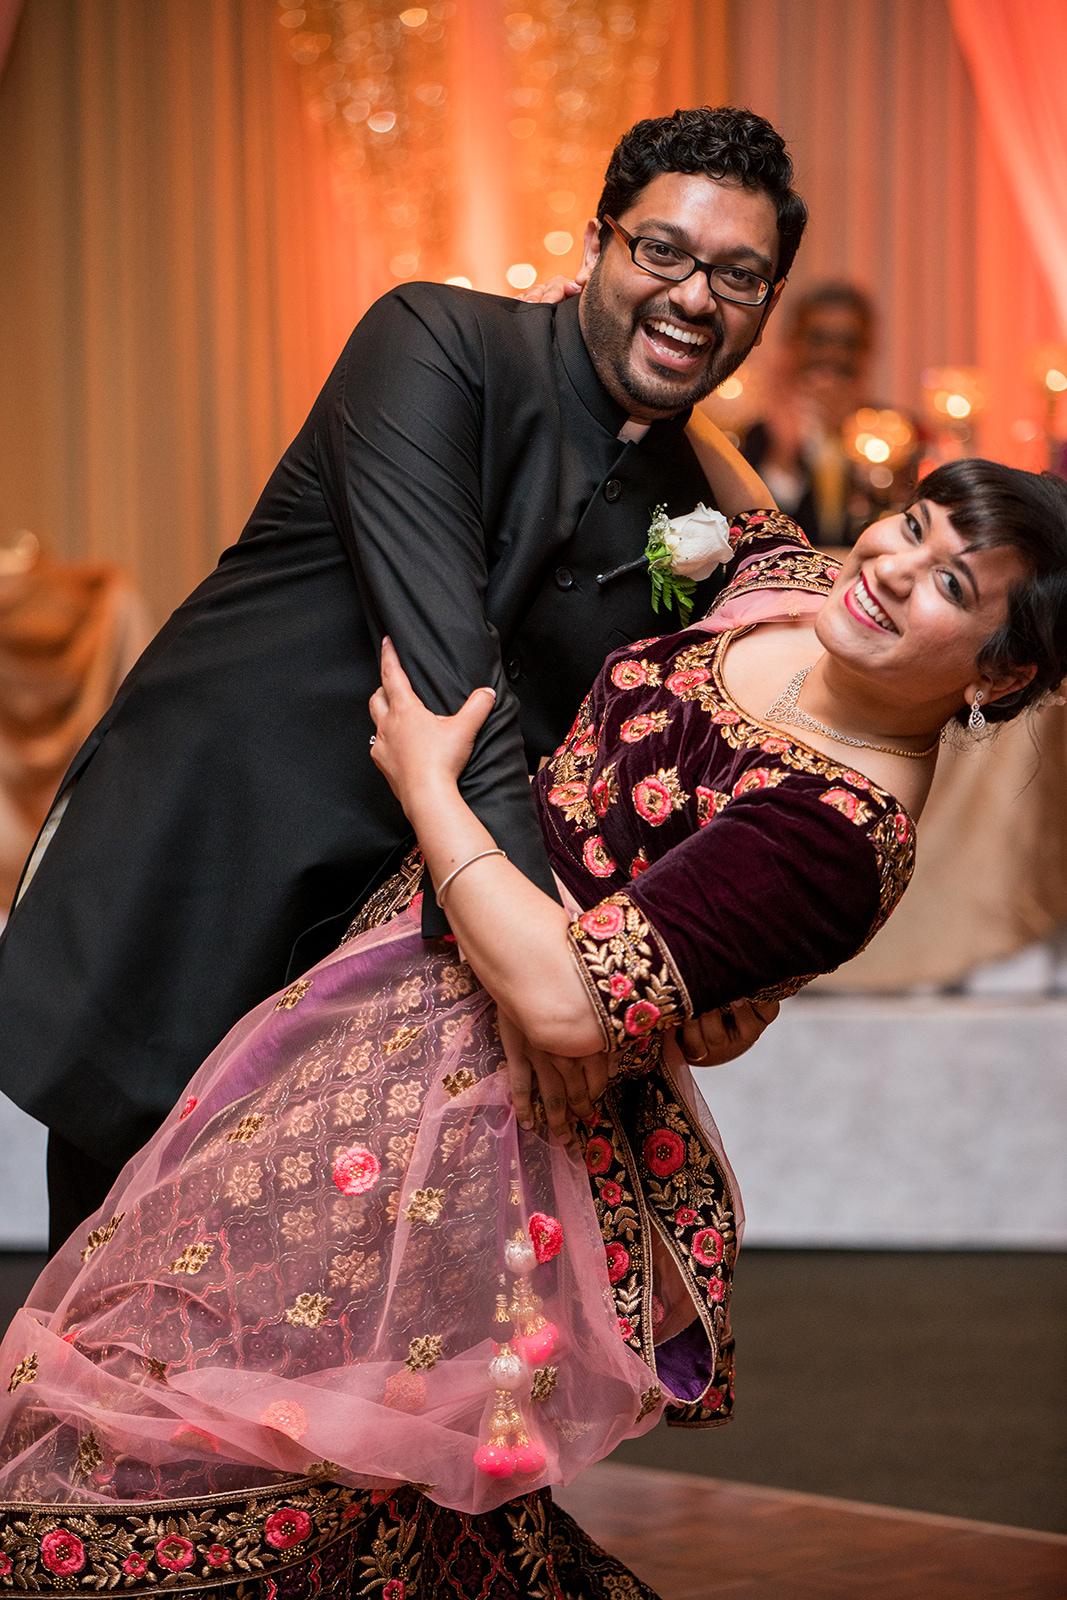 Le Cape Weddings - South Asian Wedding - Ishani and Sidhart - Wedding Reception-64.jpg